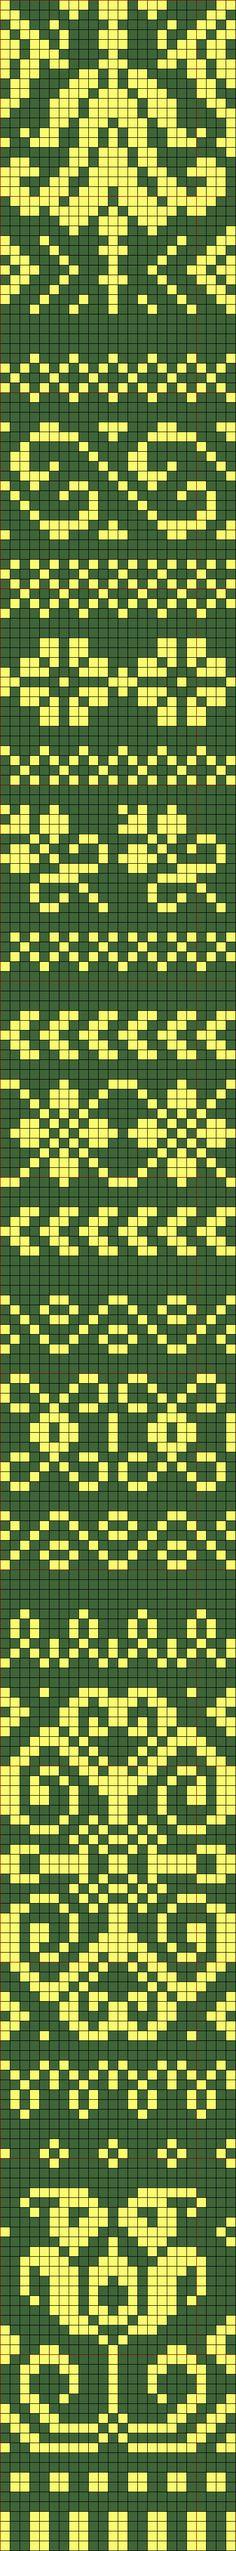 0_9a393_de9533ba_orig (JPEG-afbeelding, 481×5201 pixels) - Geschaald (12%)